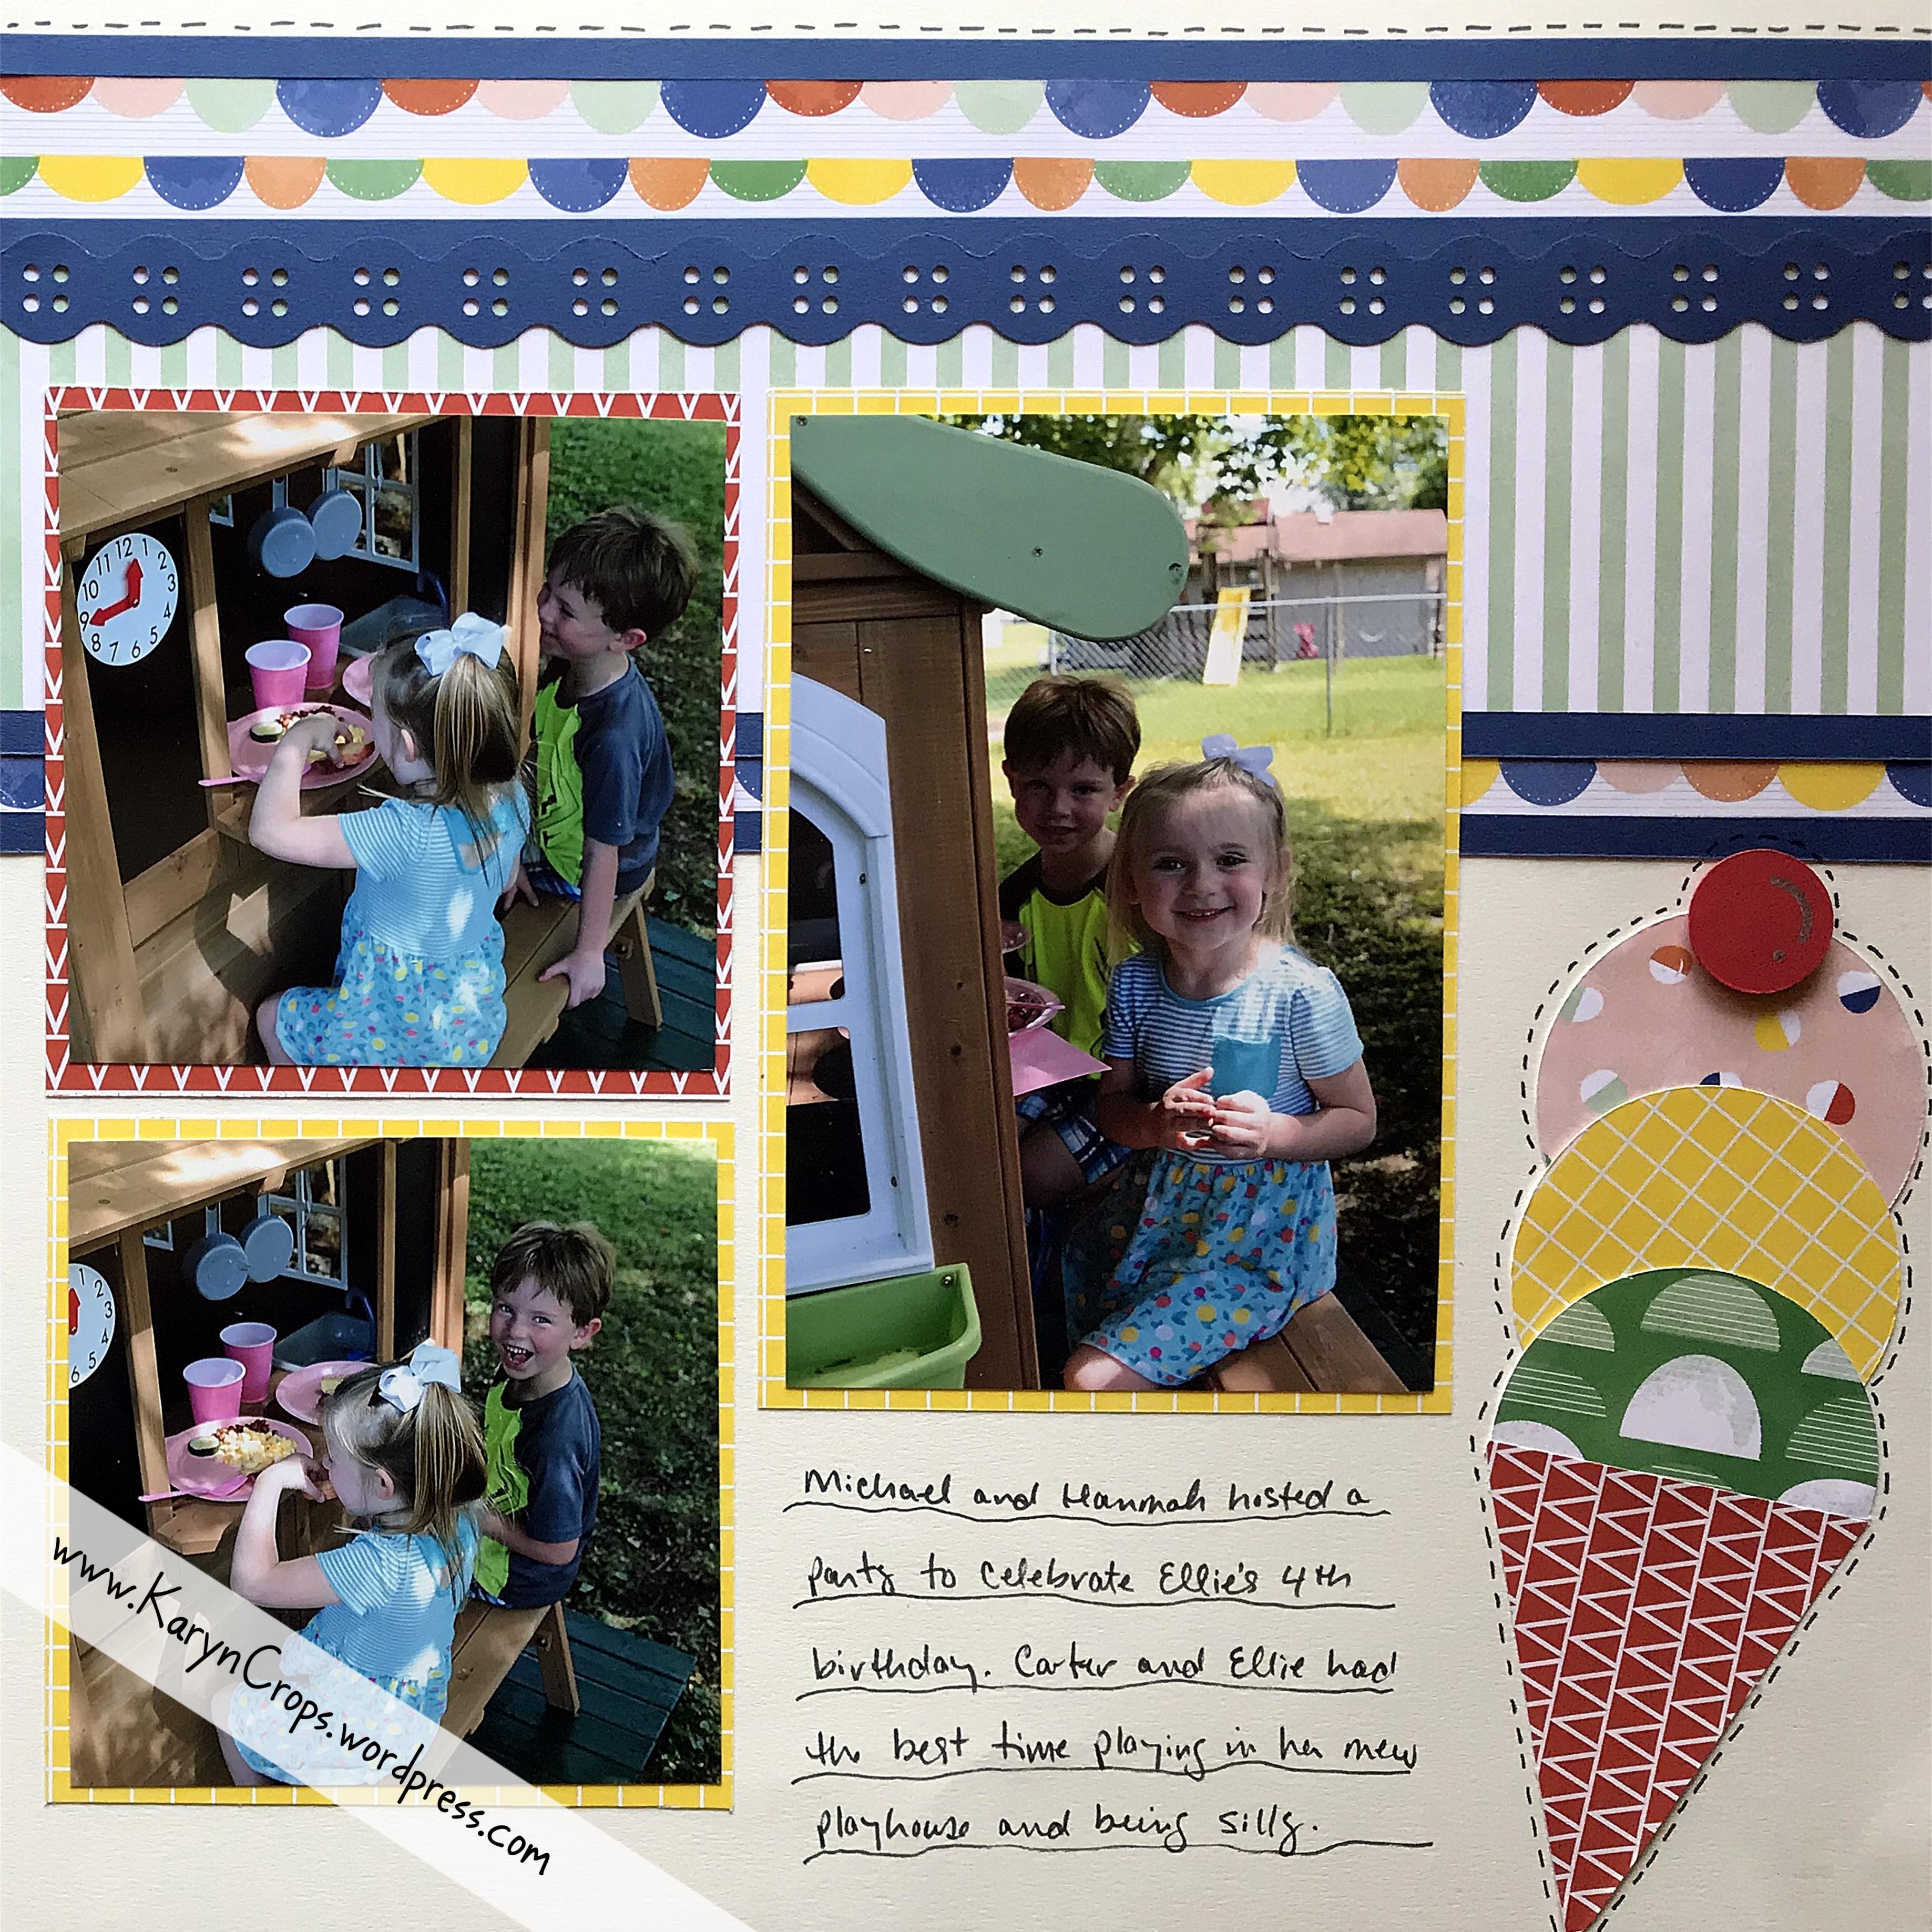 KarynCropsWordpressNSDLayouts3 - Page 074